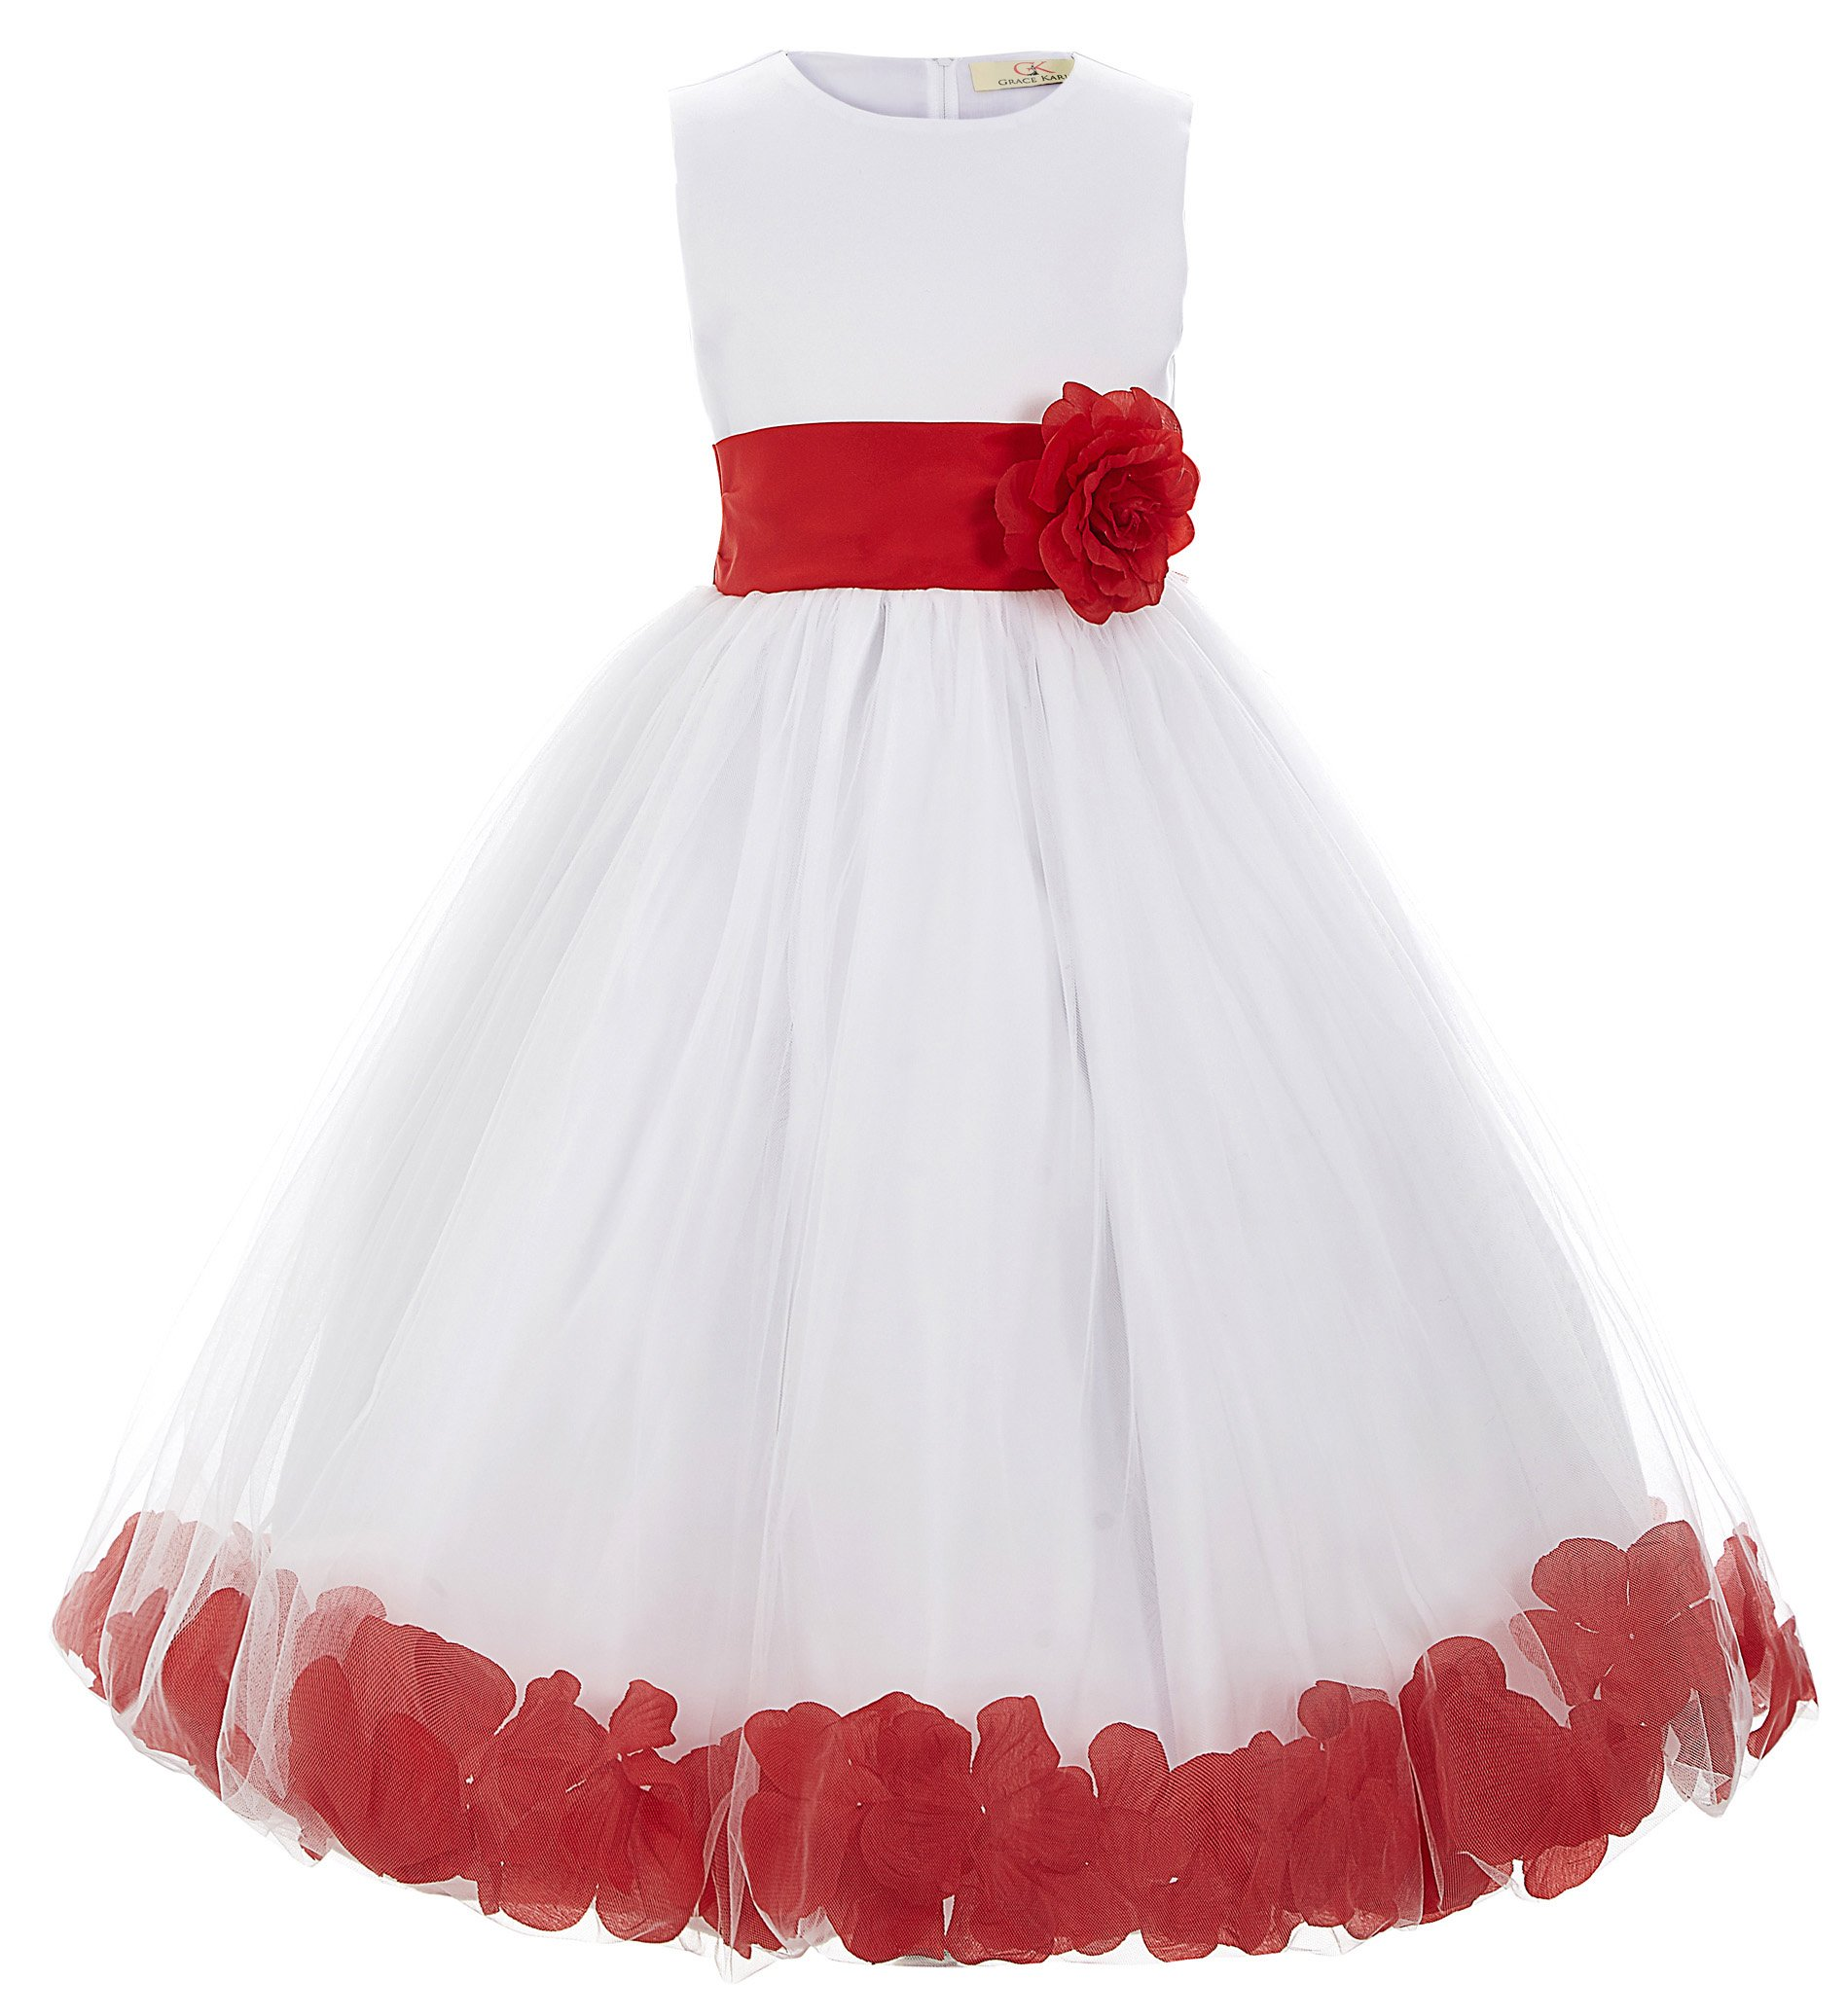 GRACE KARIN Niñas Vestido Largo Elegante de Princesa con Flores para Dama de Honor Fiesta de